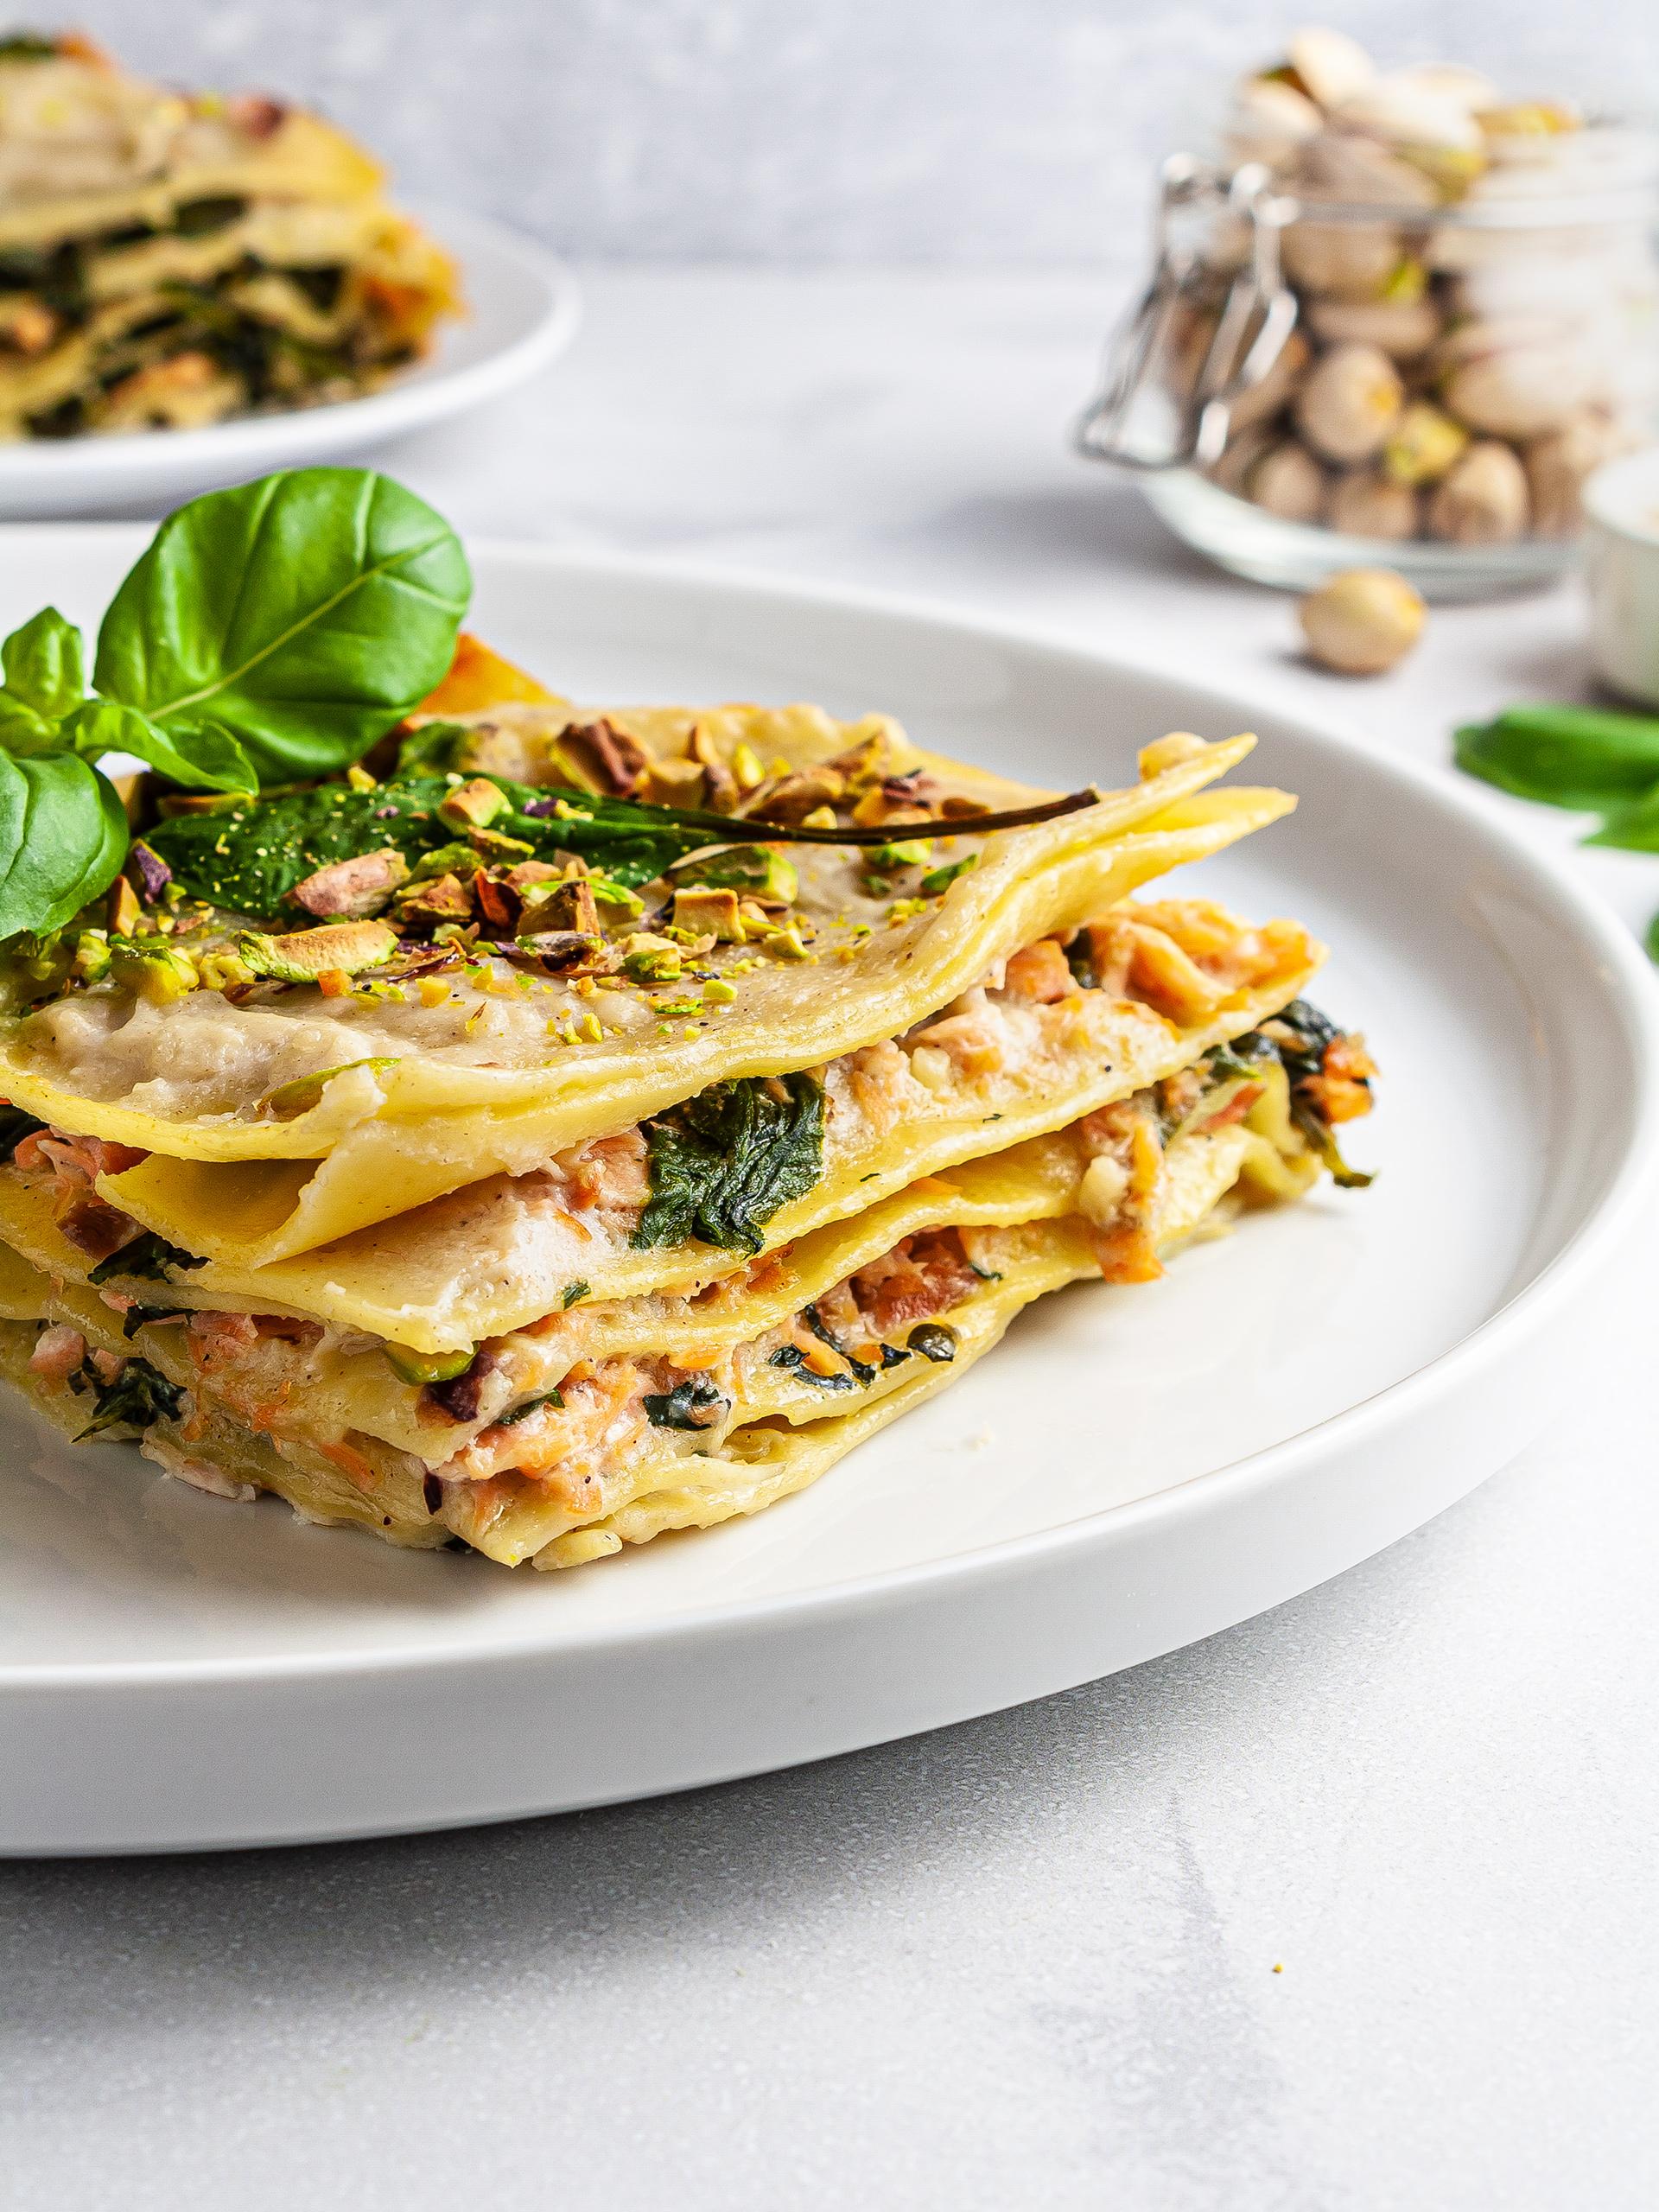 Dairy-Free Spinach Salmon Lasagna Recipe Preview